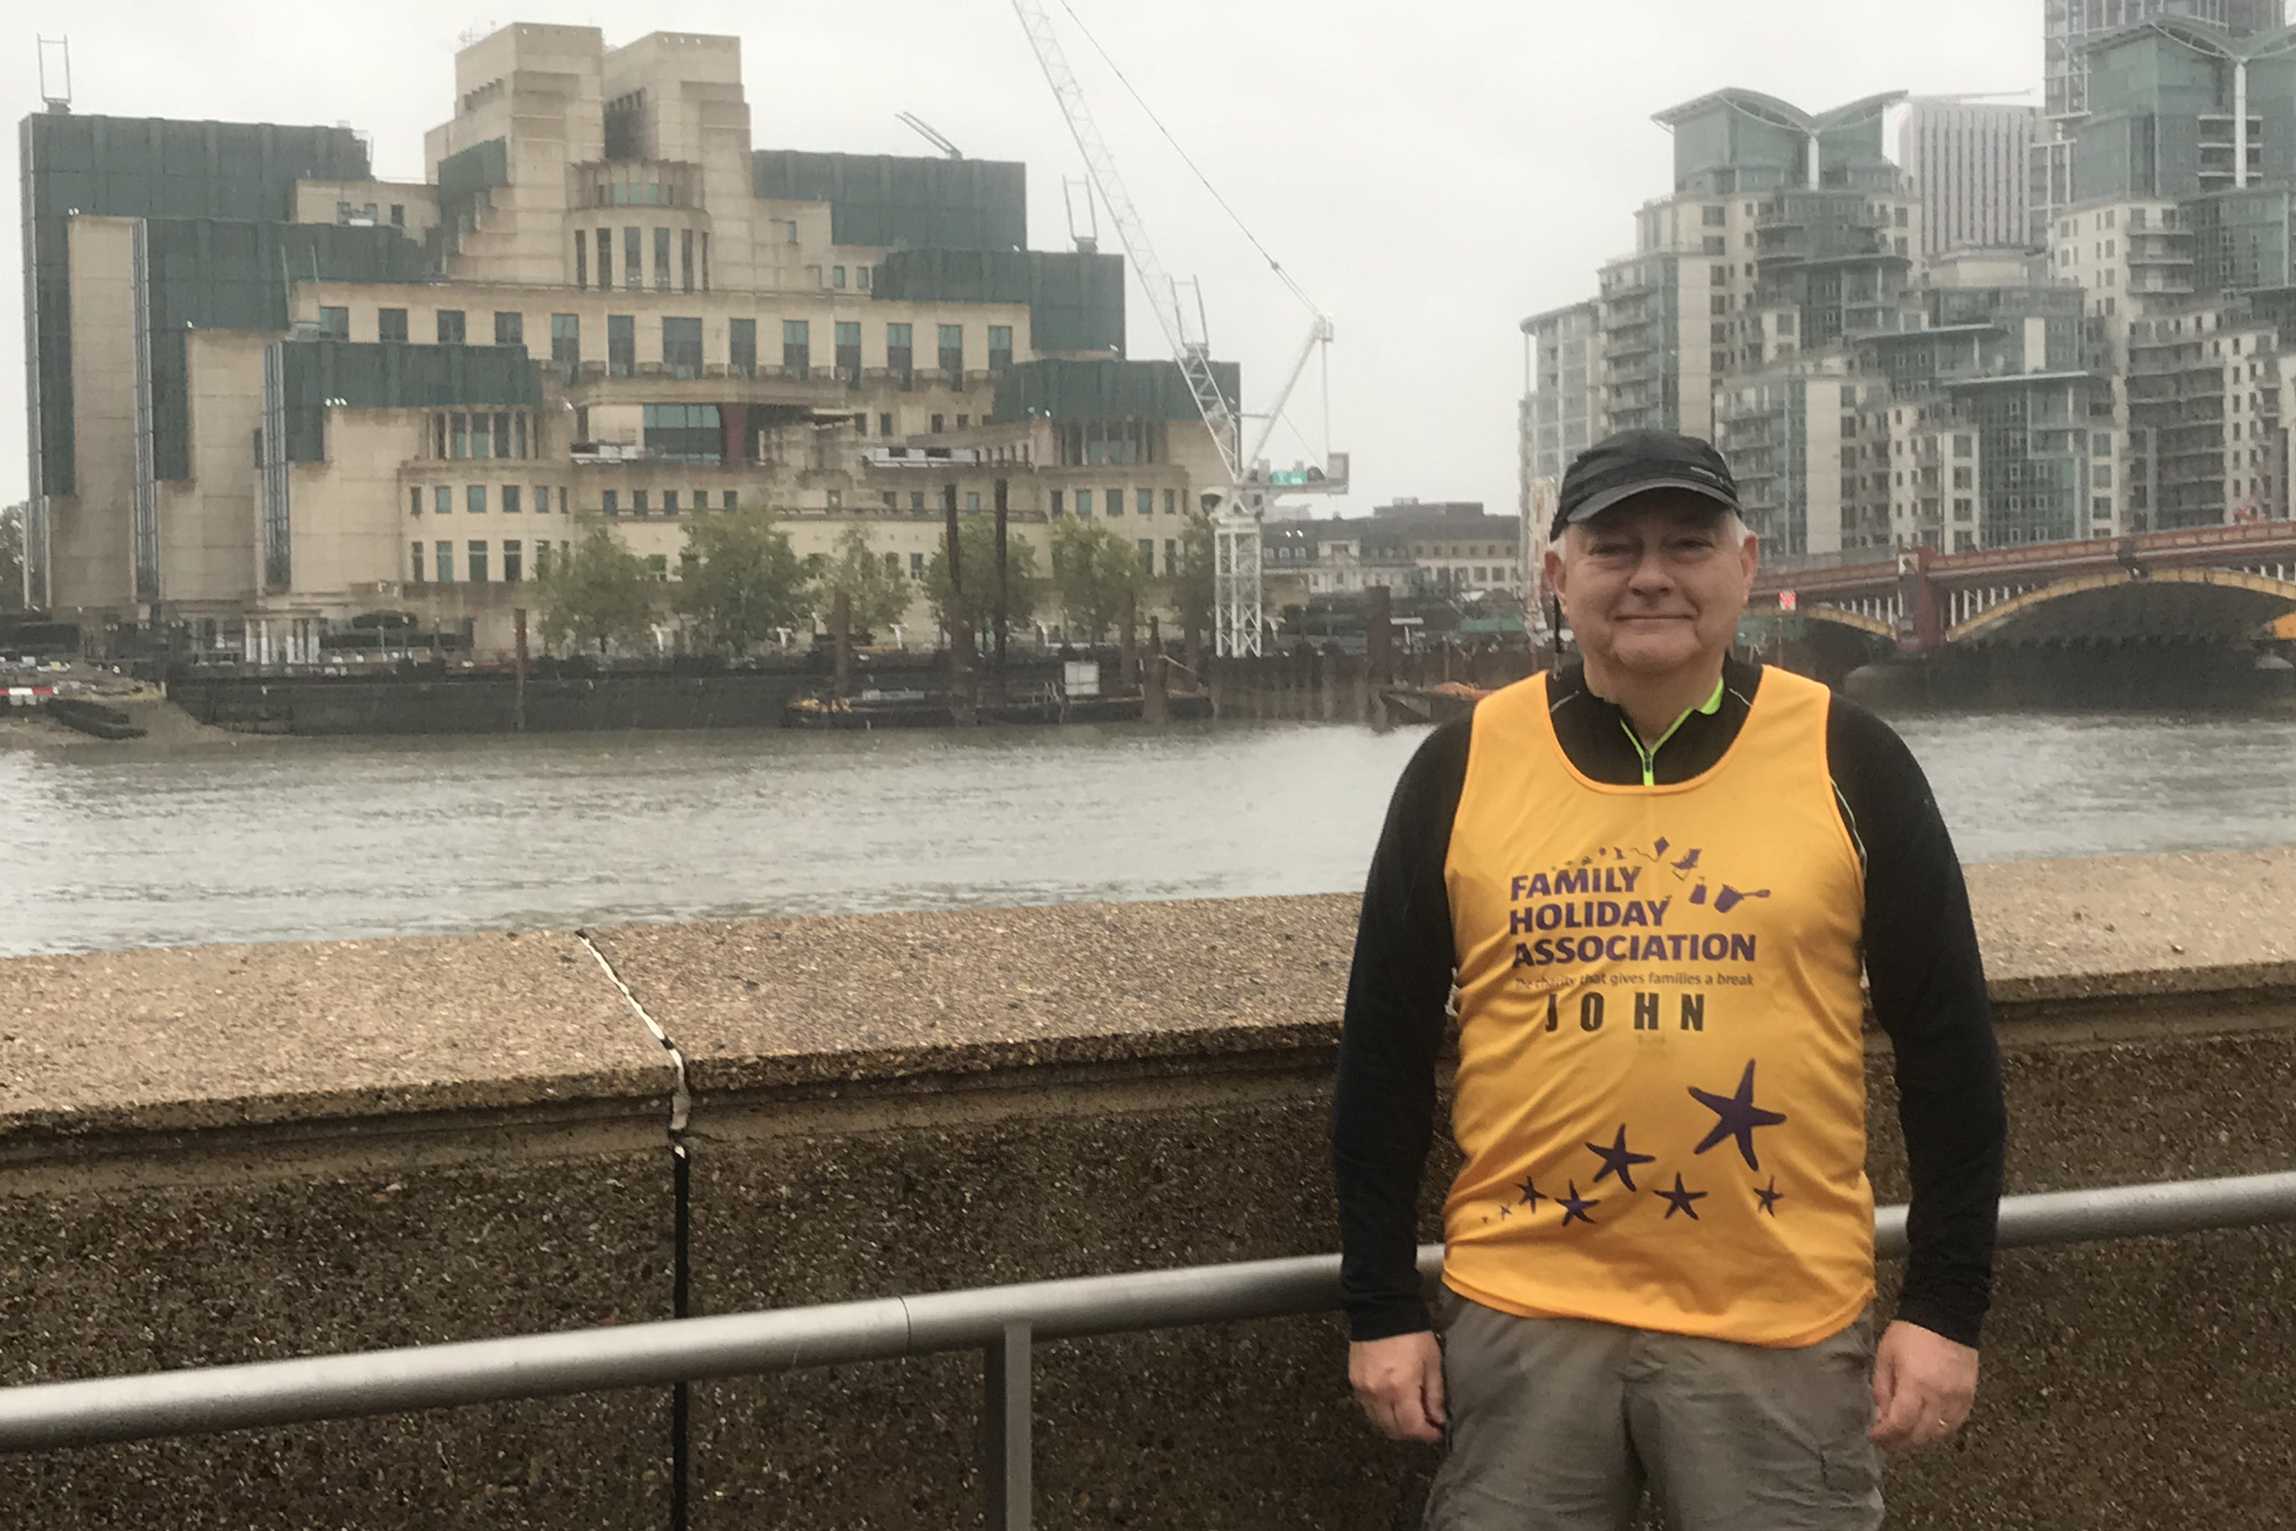 John de Vial pictured during his 2020 London Marathon